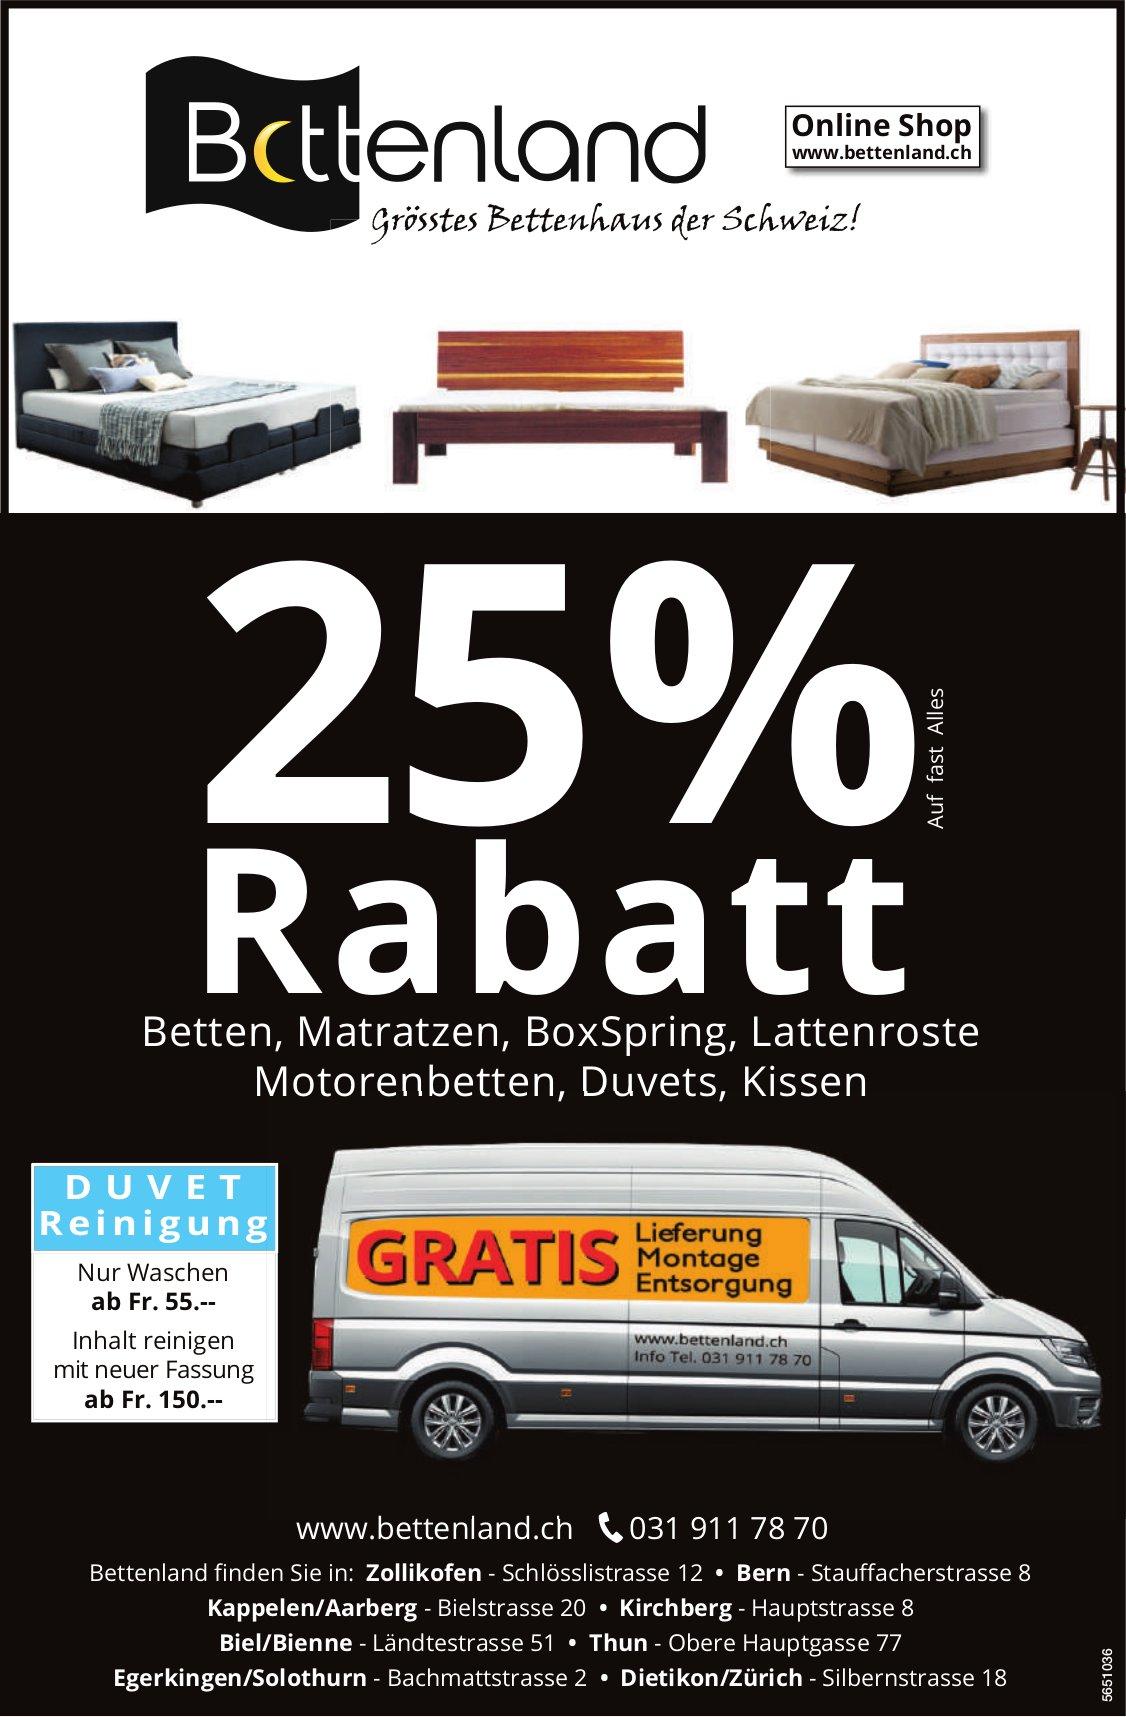 Bettenland, 25% Rabatt auf Betten, Matratzen, BoxSpring, Lattenroste...